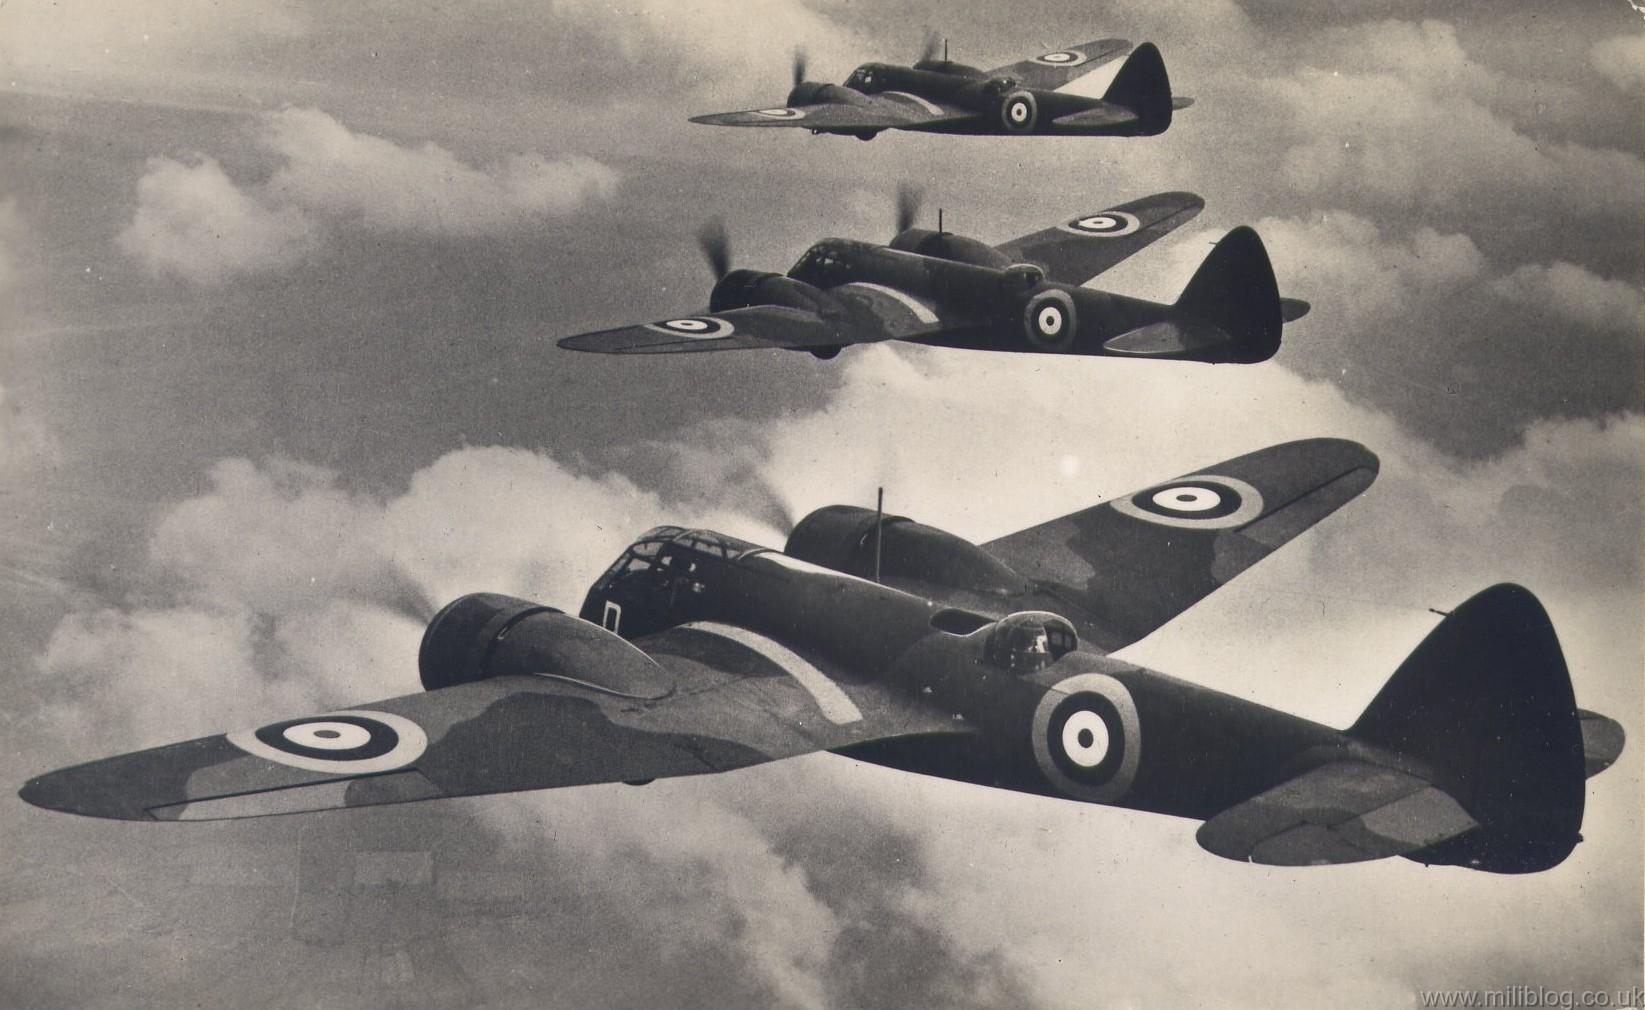 bristol-blenheim-mk1-bombers.jpg (1645×1010)